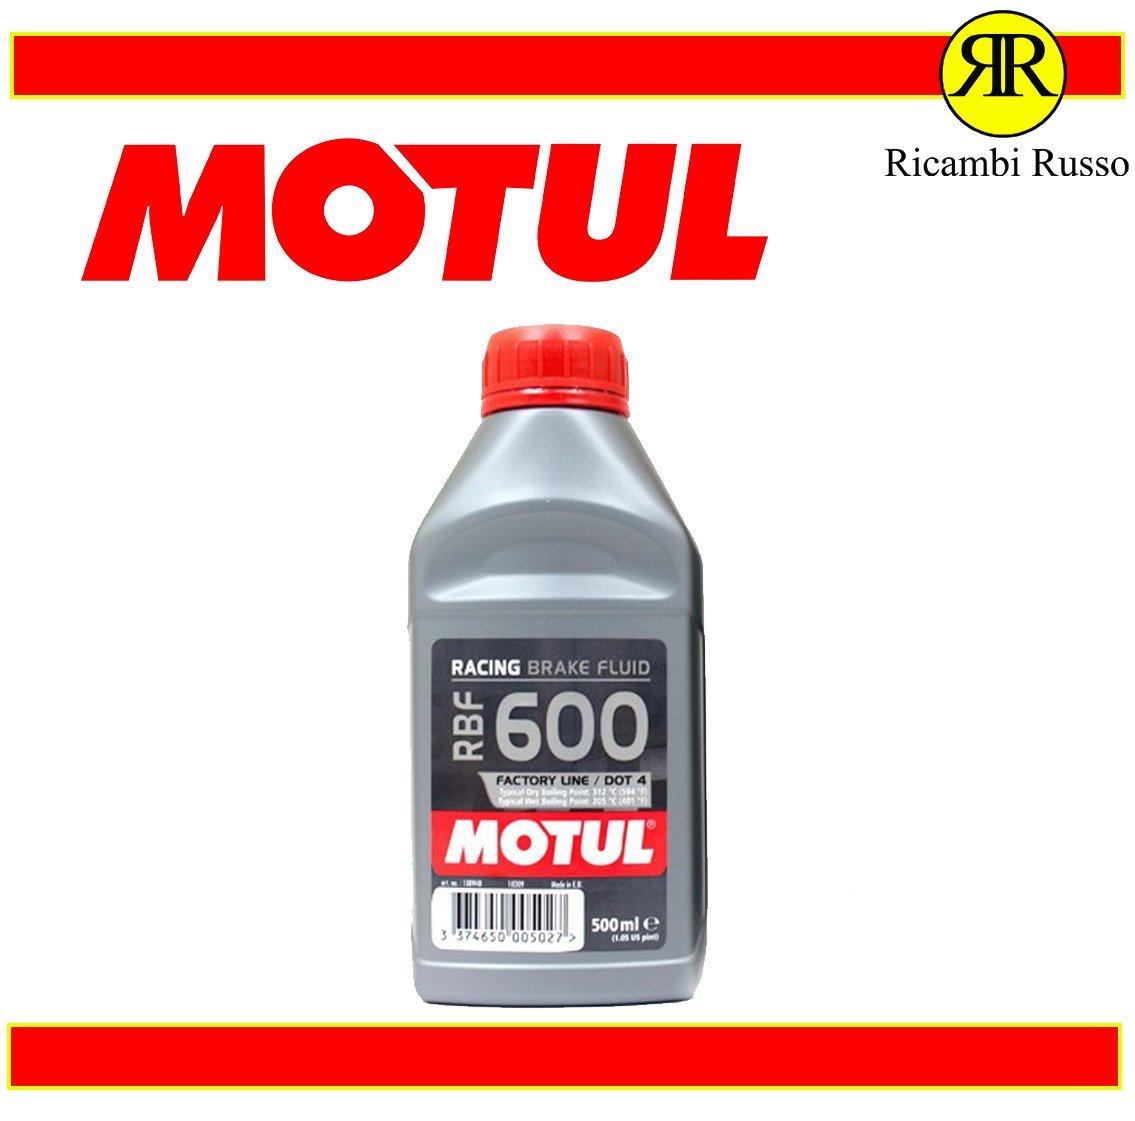 Ricambi Russo MOTUL RBF 600 OLIO LIQUIDO FRENI RACING DOT4 500ml SYNT 100% BRAKE FLUID MOTO